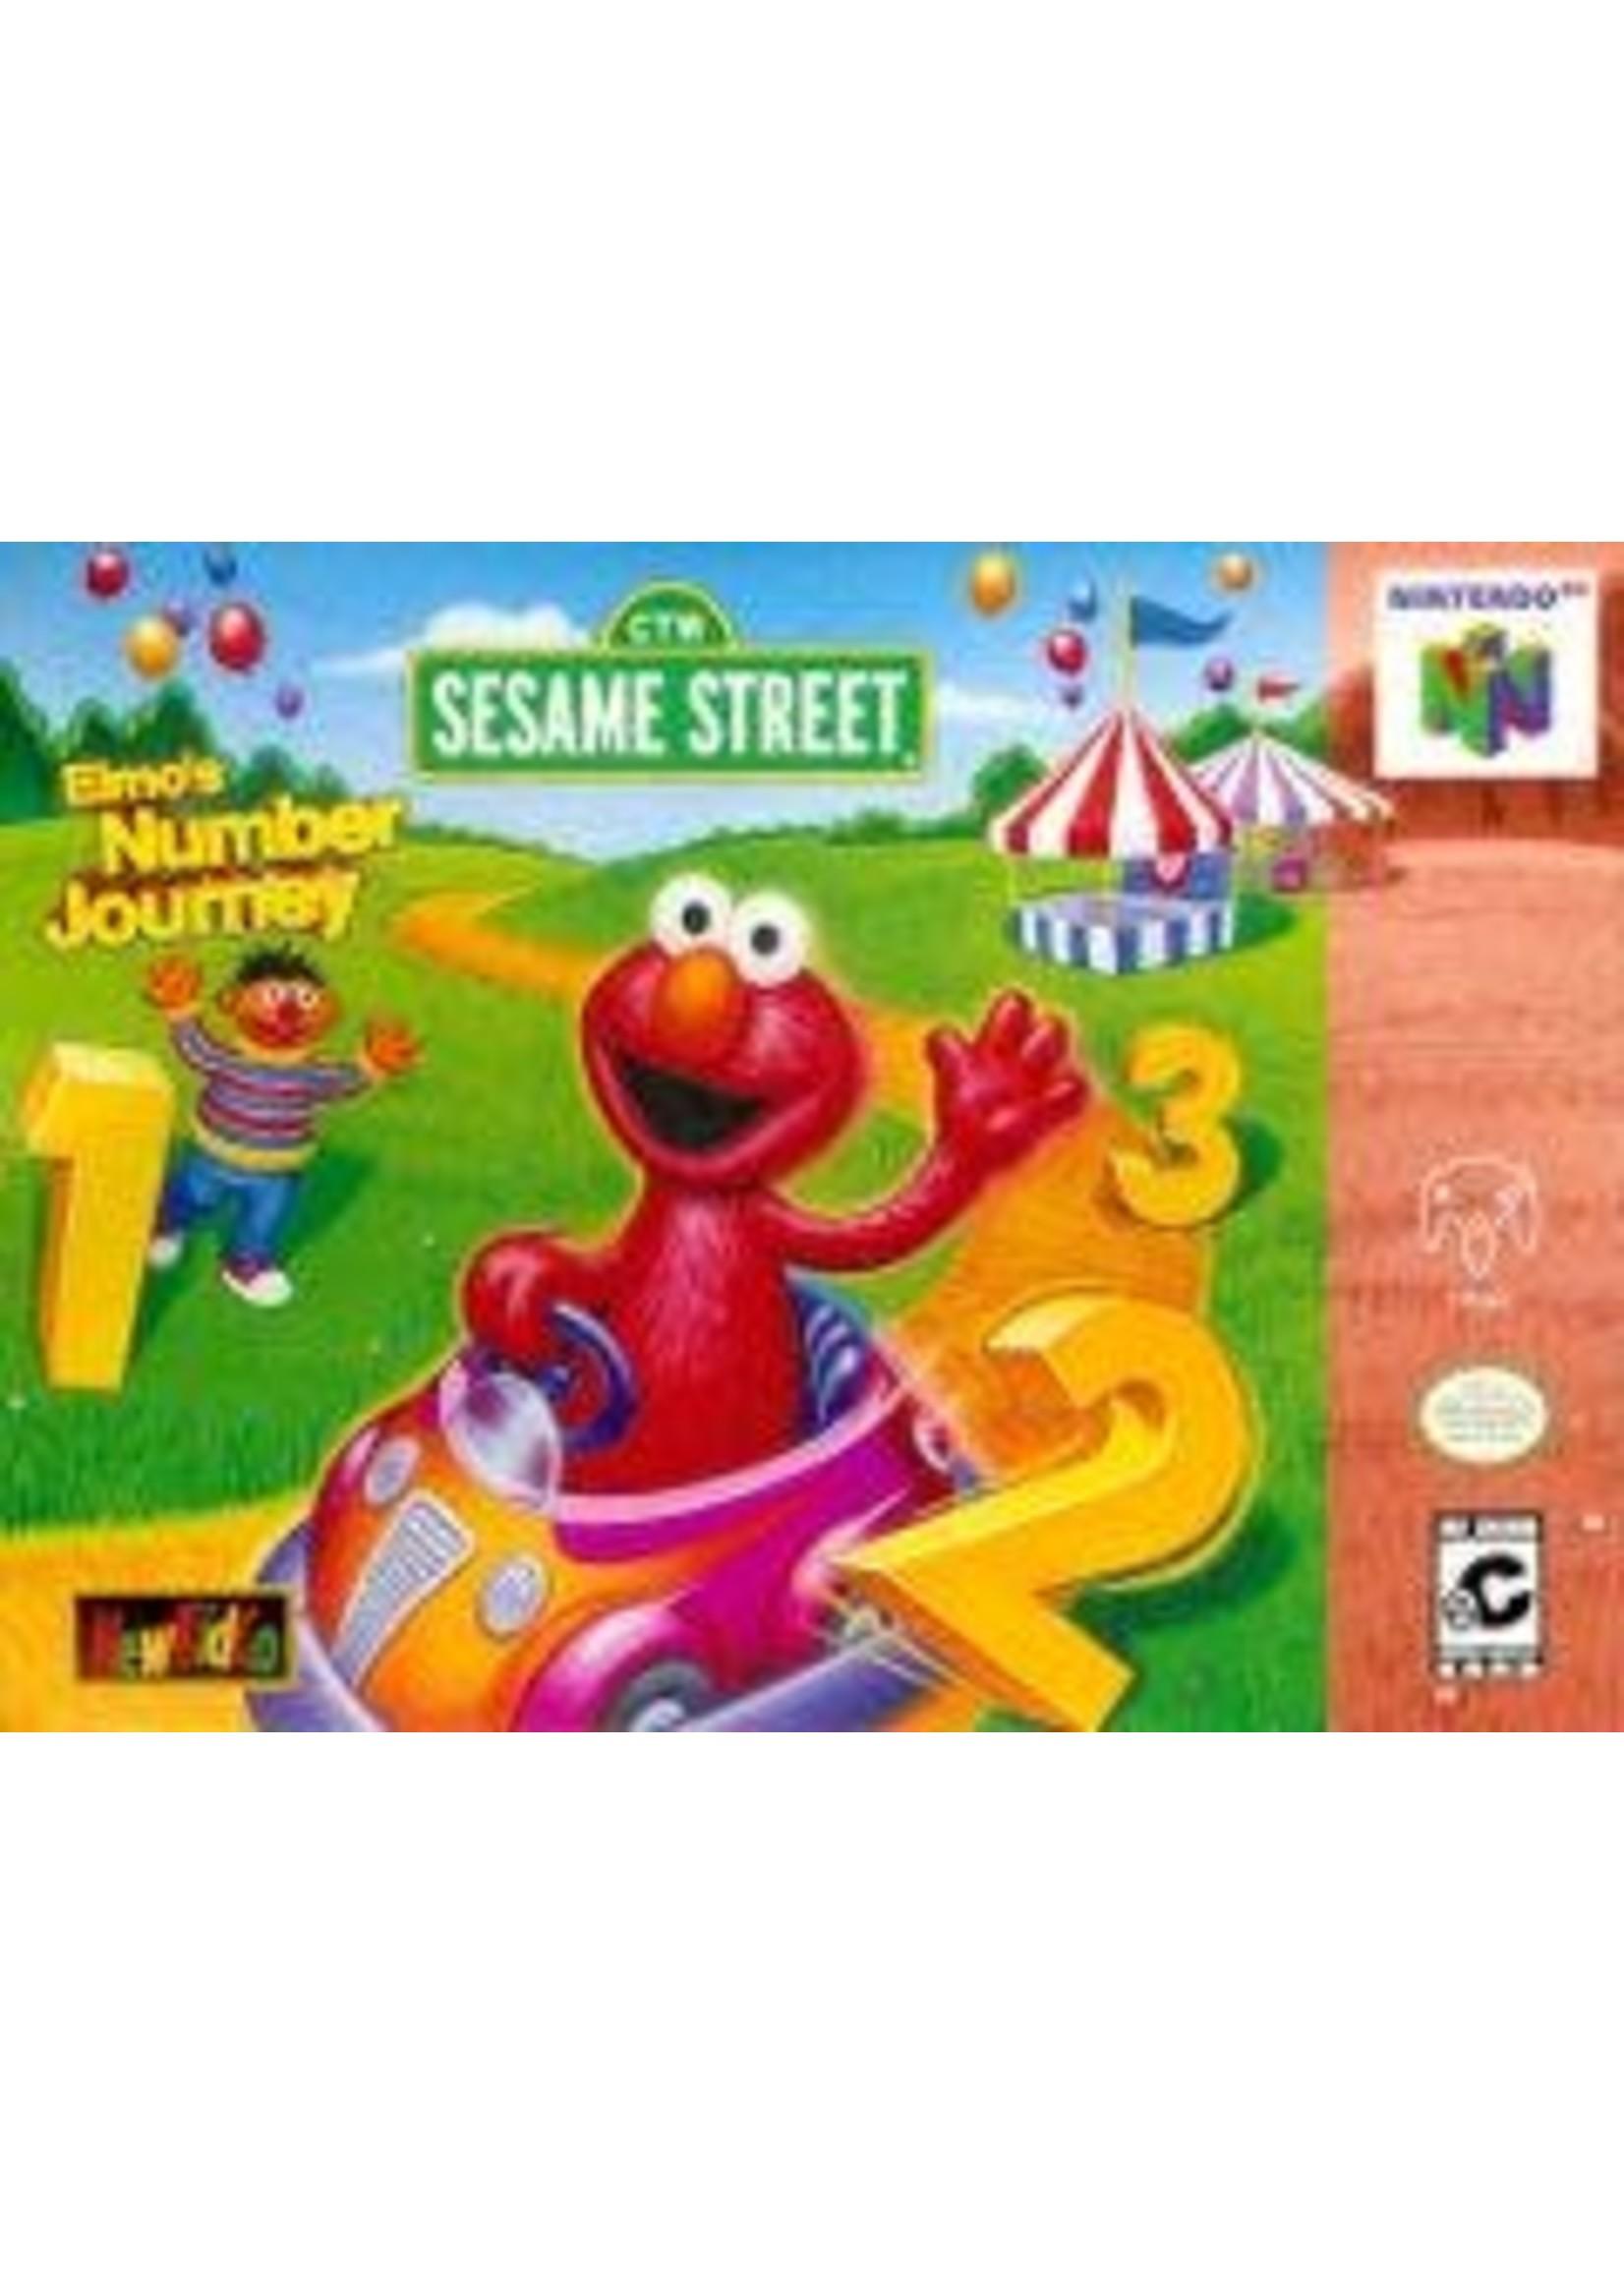 Elmo's Number Journey Nintendo 64